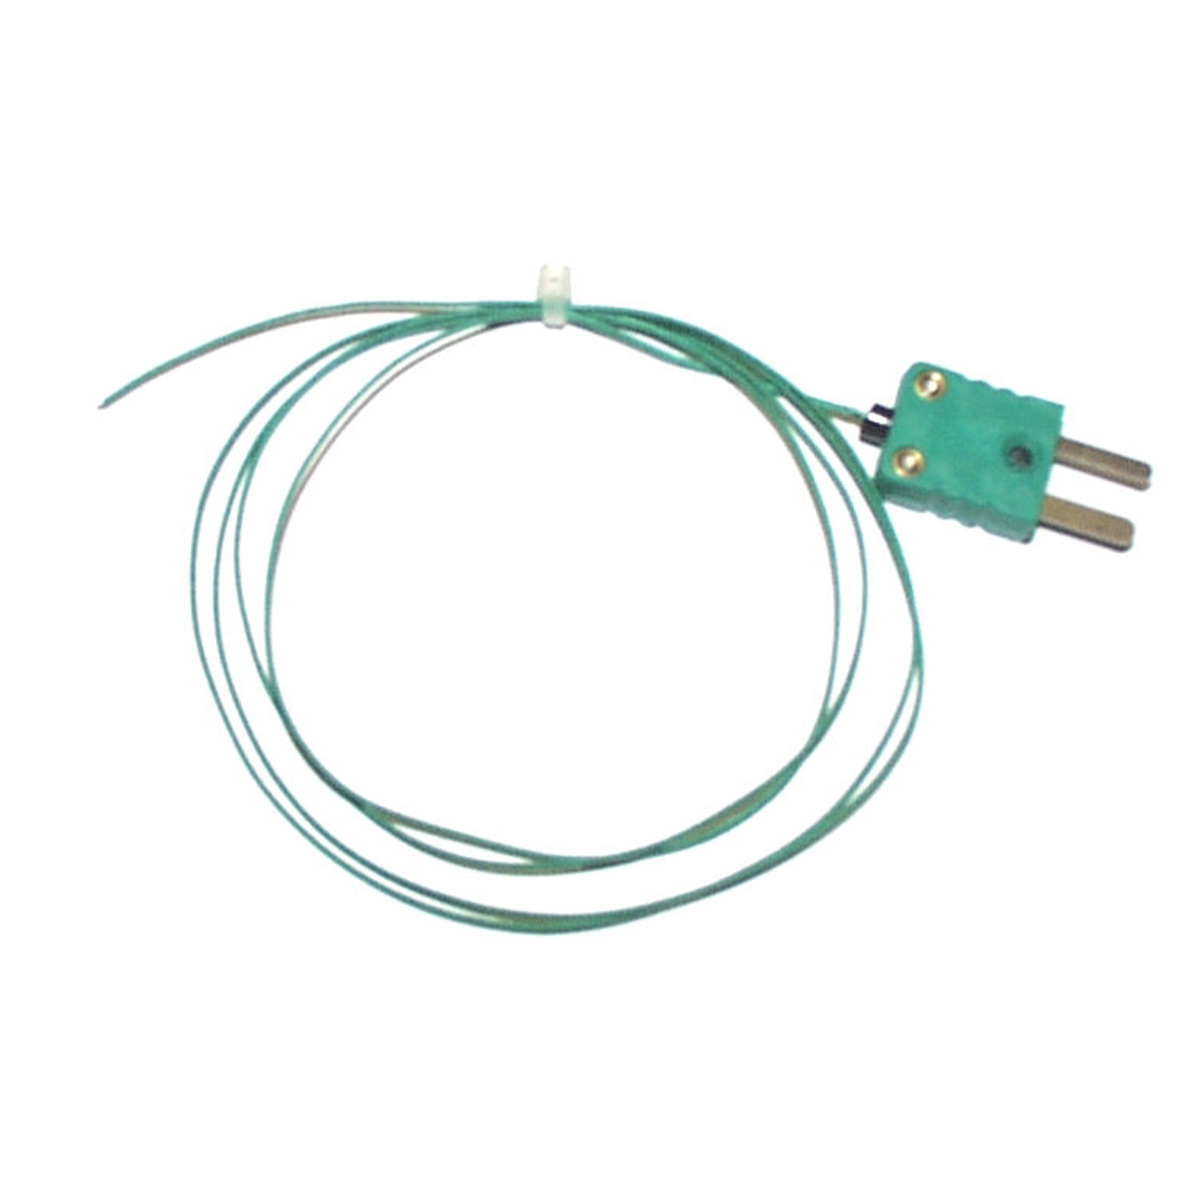 30-3500-kabel-thermoelementfühler-1200x1200px.jpg